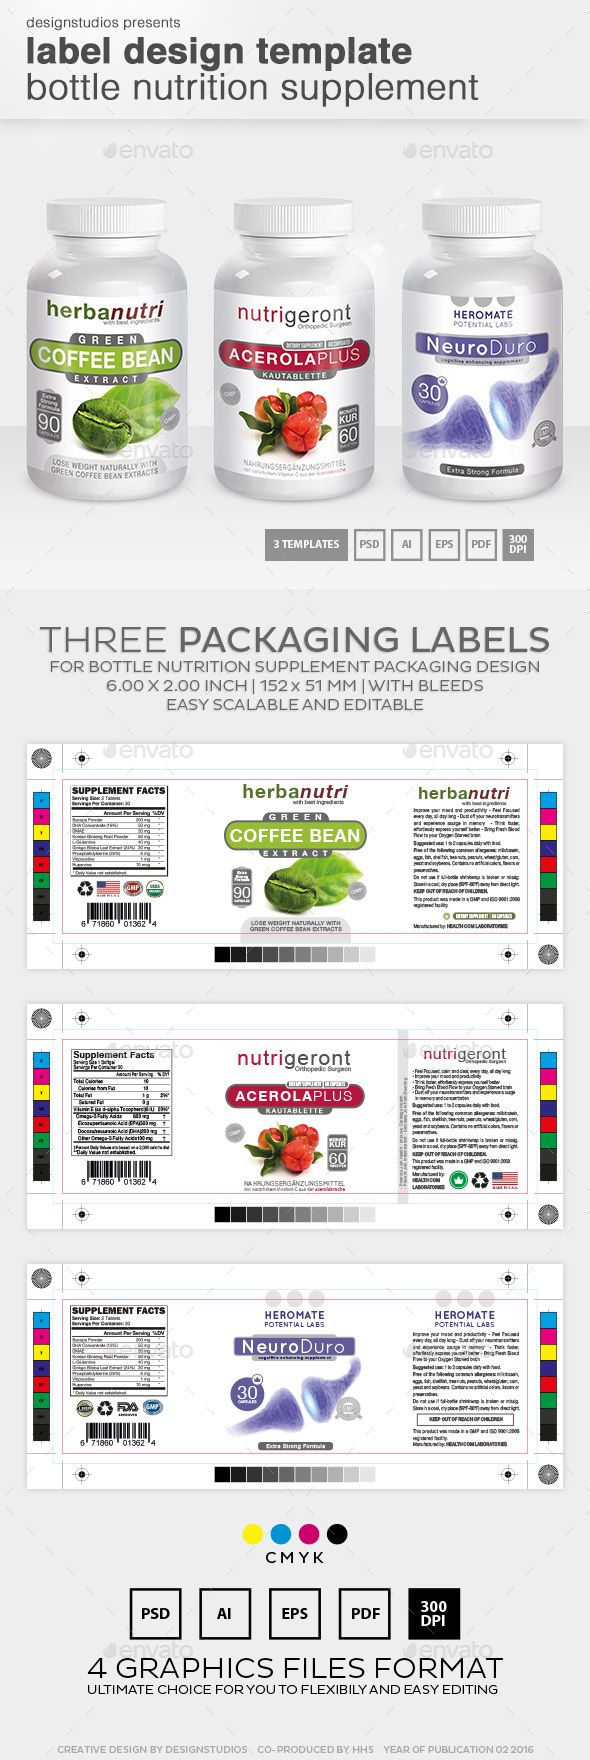 Label Design Template Bottle Nutrition Supplement  Print